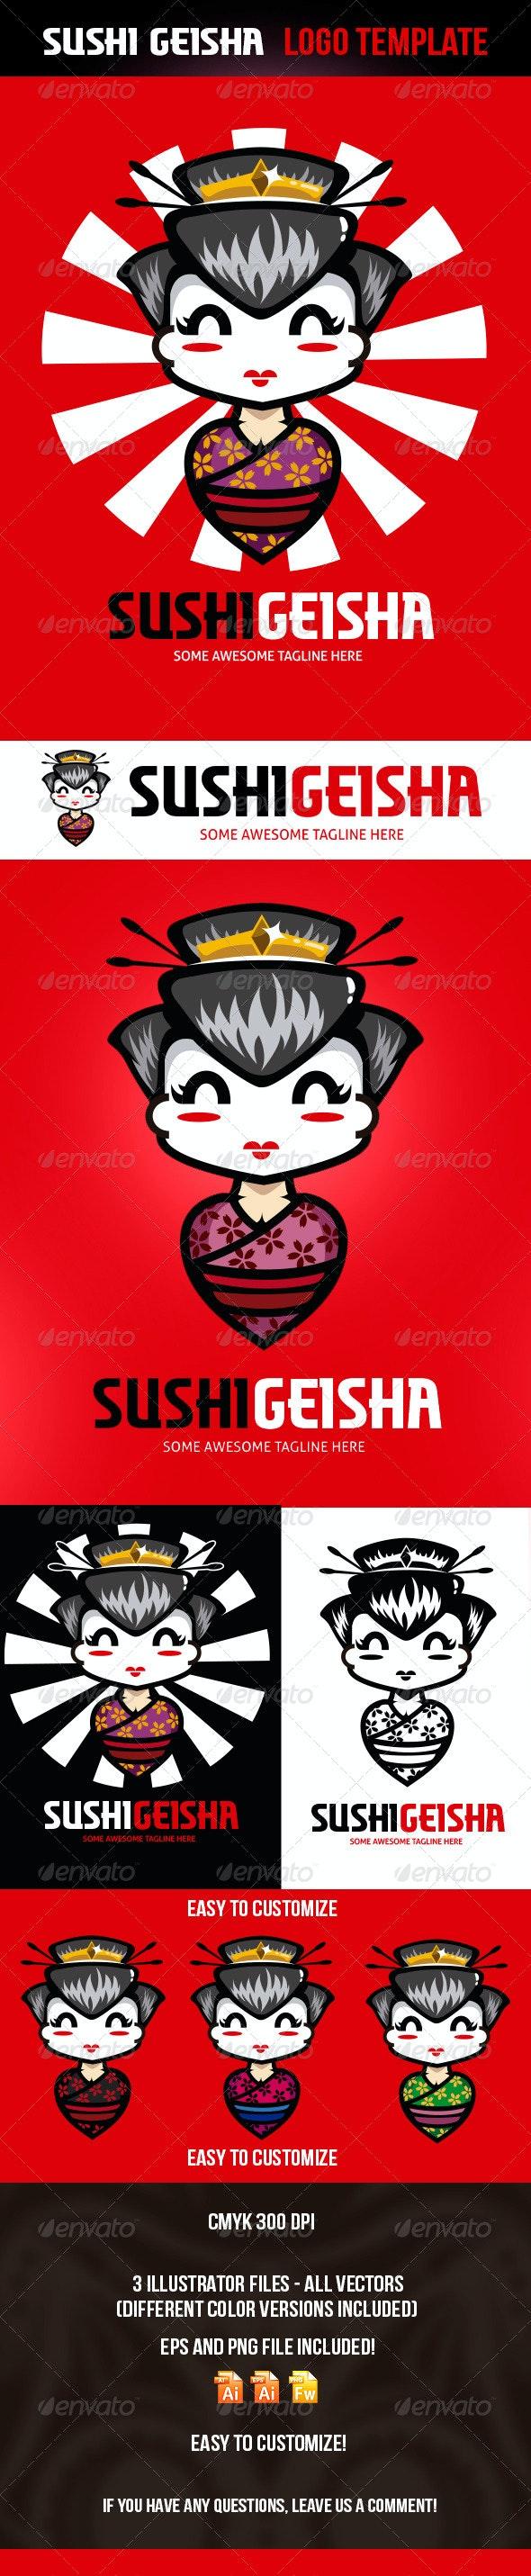 Sushi Geisha Logo Template - Logo Templates